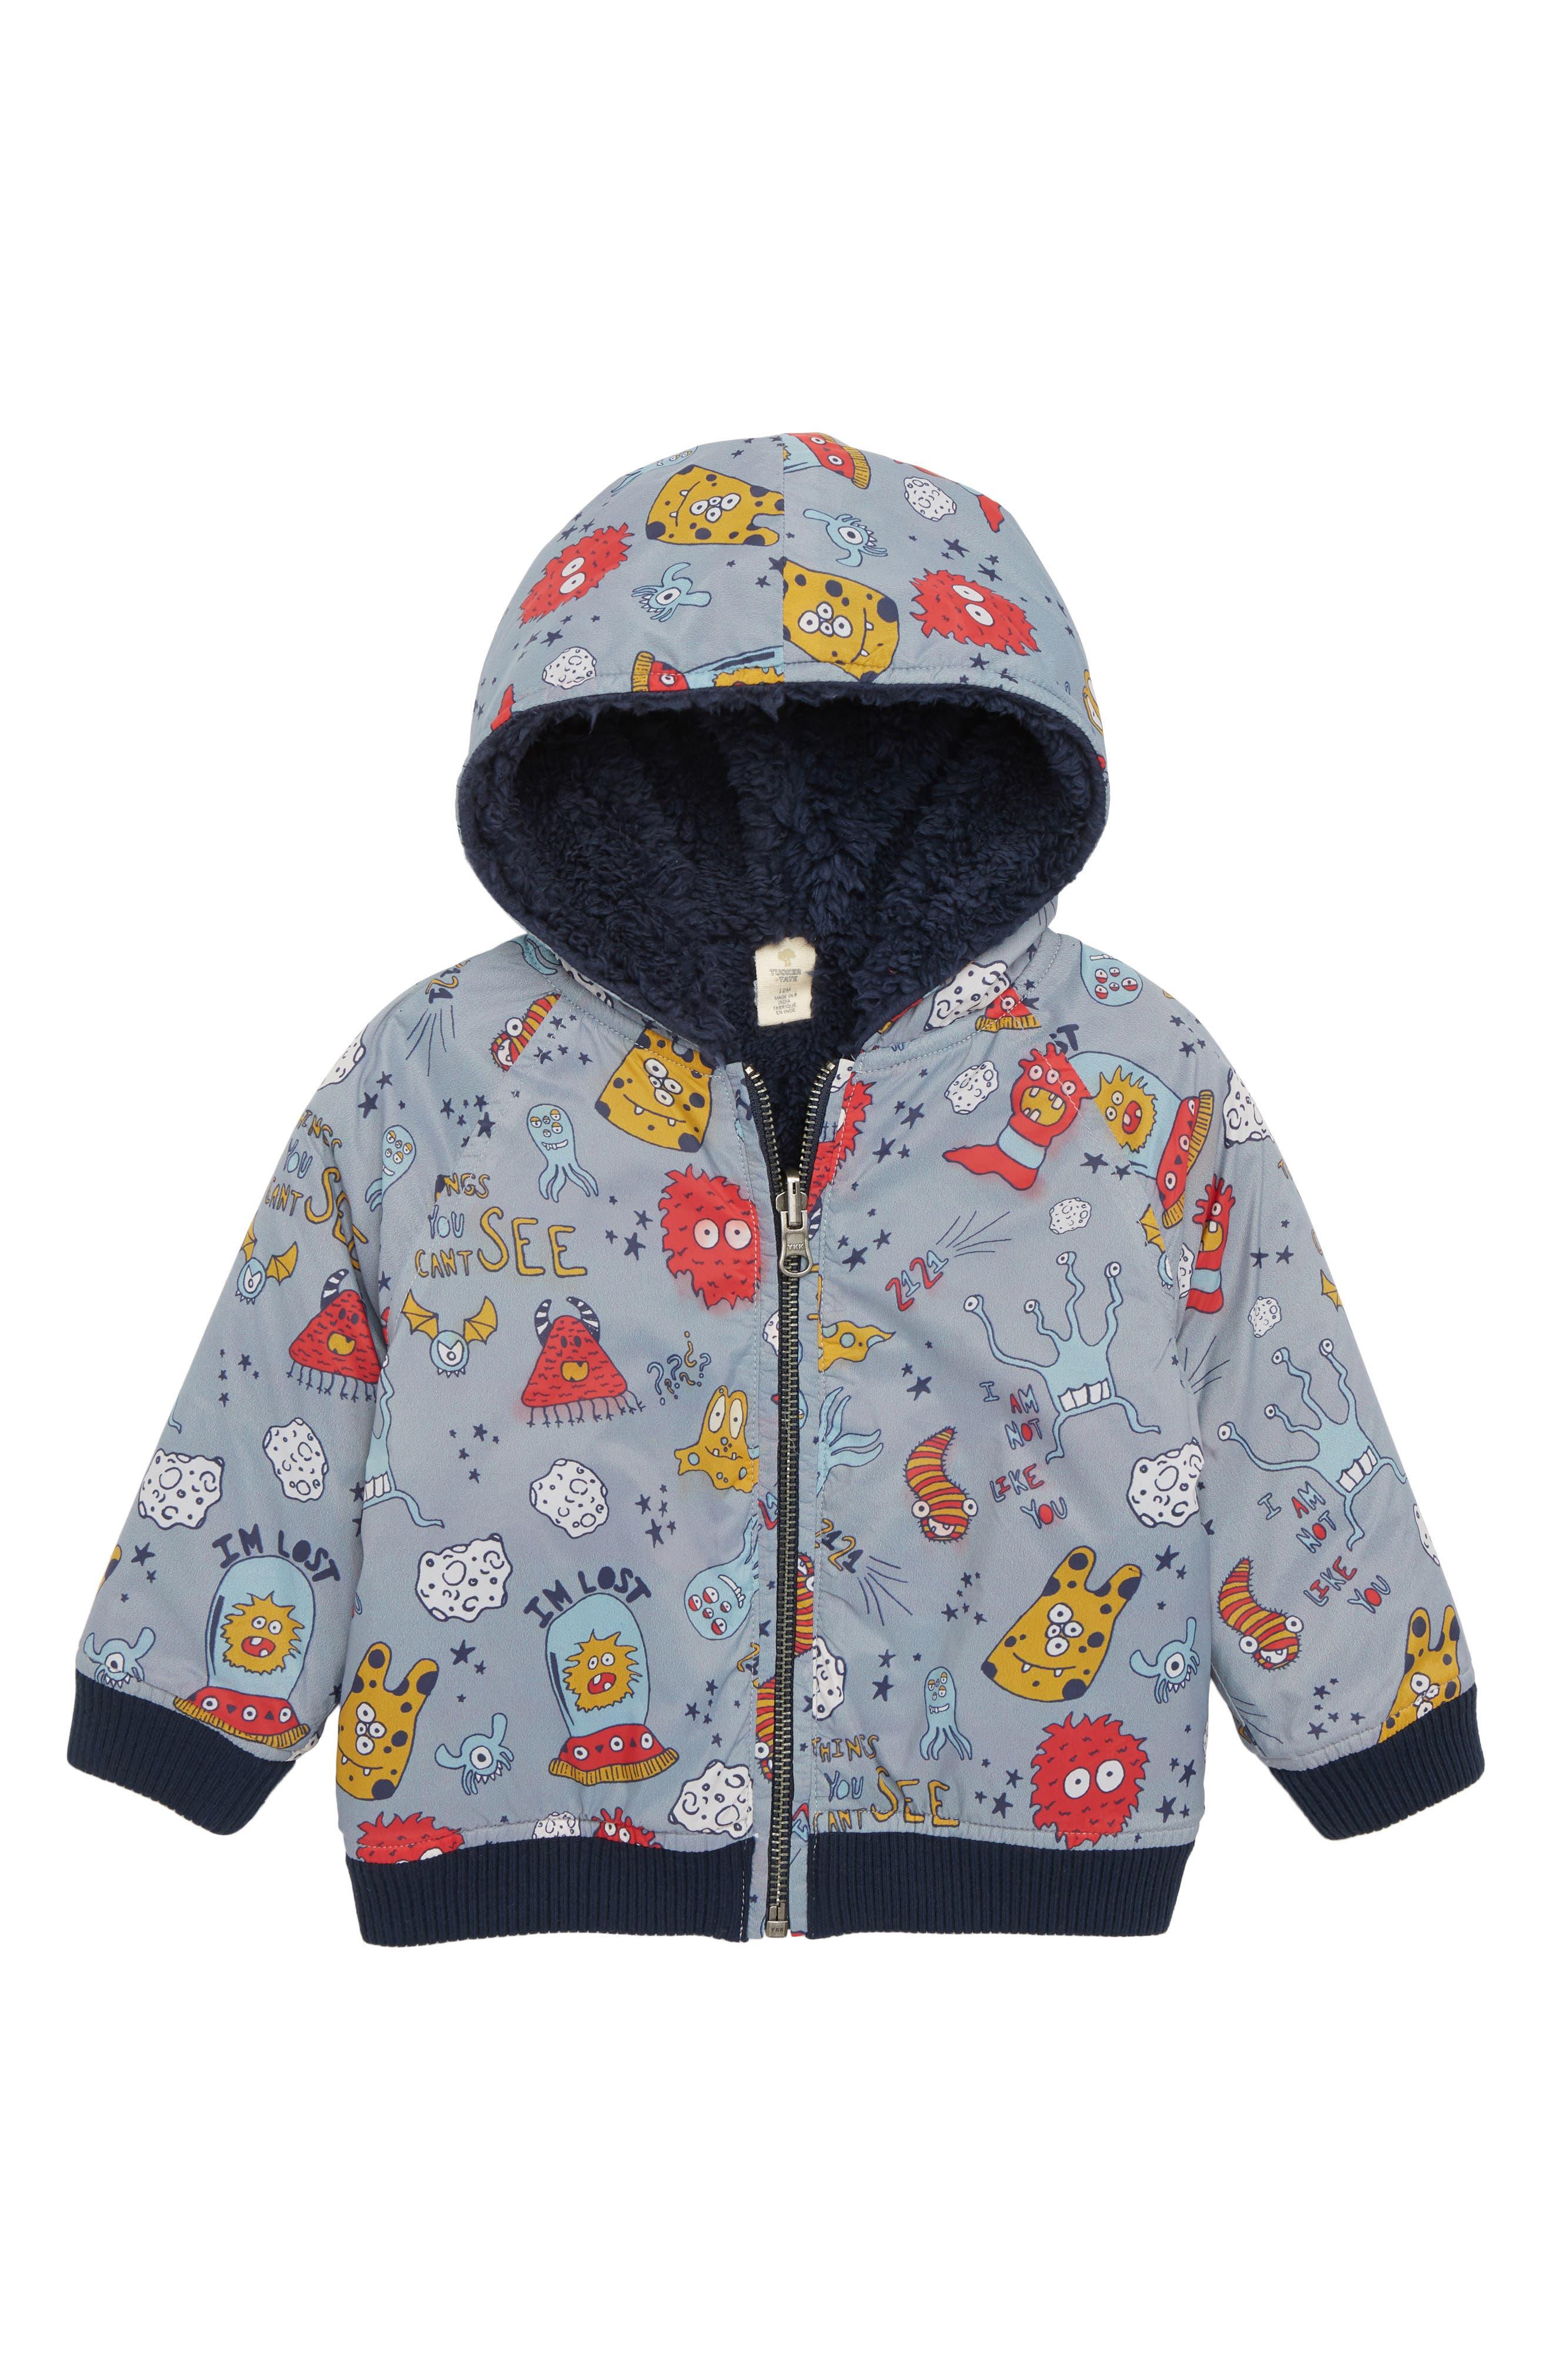 Reversible Hooded Jacket,                             Main thumbnail 1, color,                             050